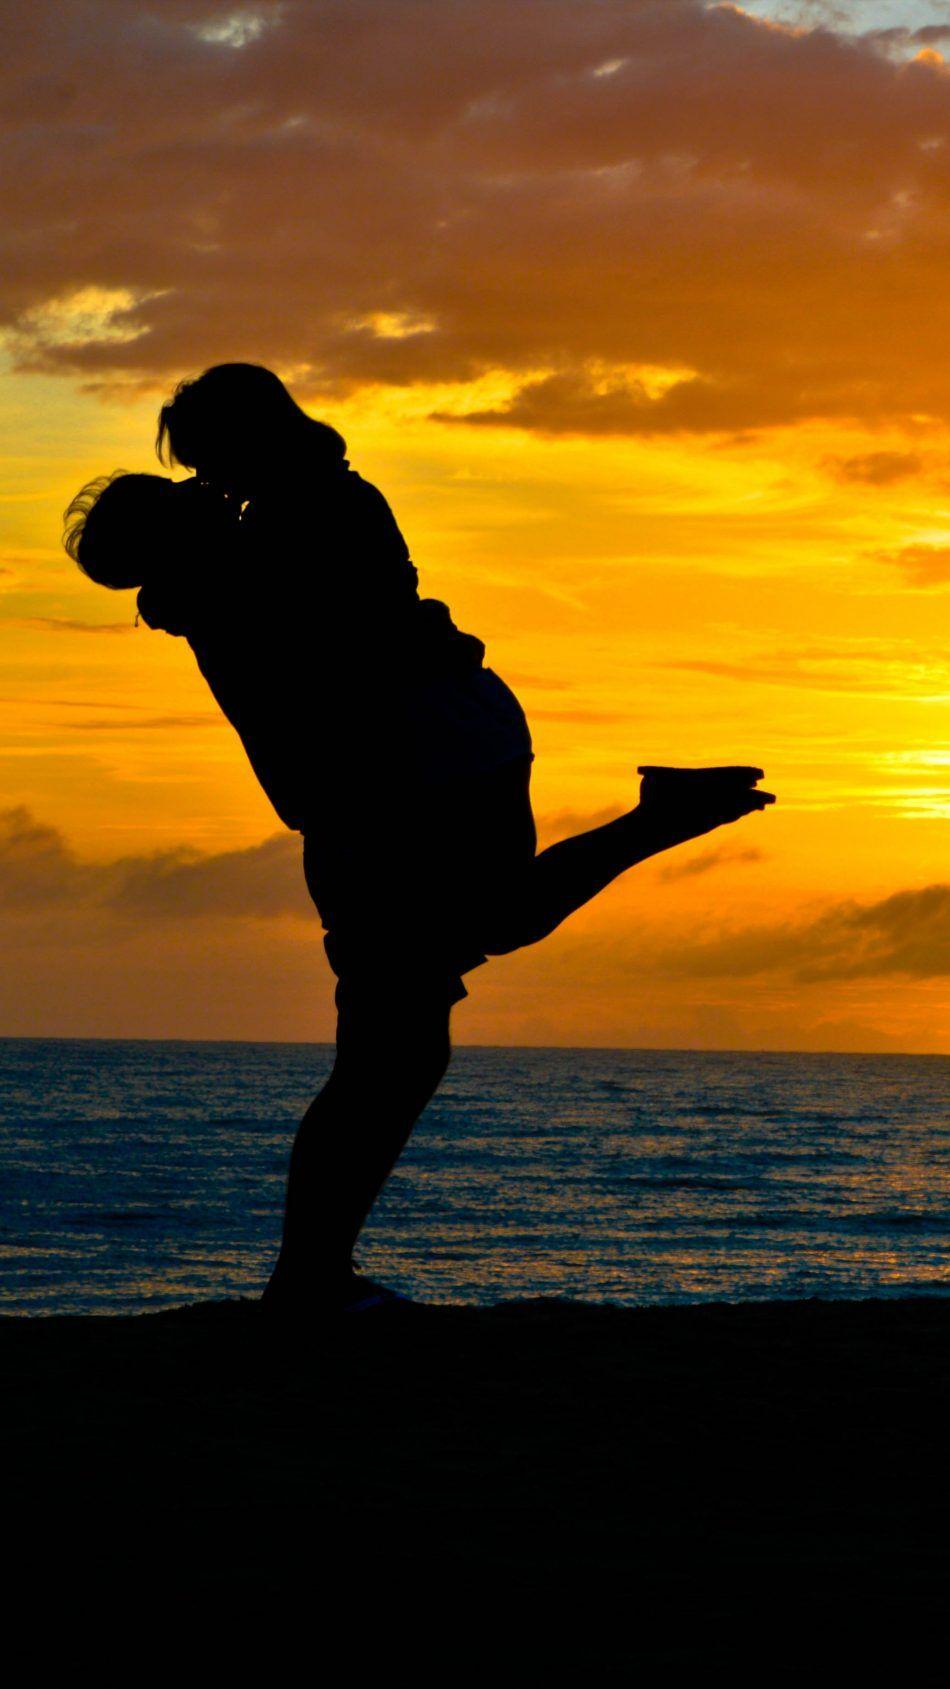 Couple Romantic Kiss Sea Sunset Silhouette Sunset Silhouette Fall Wallpaper Iphone Wallpaper Fall